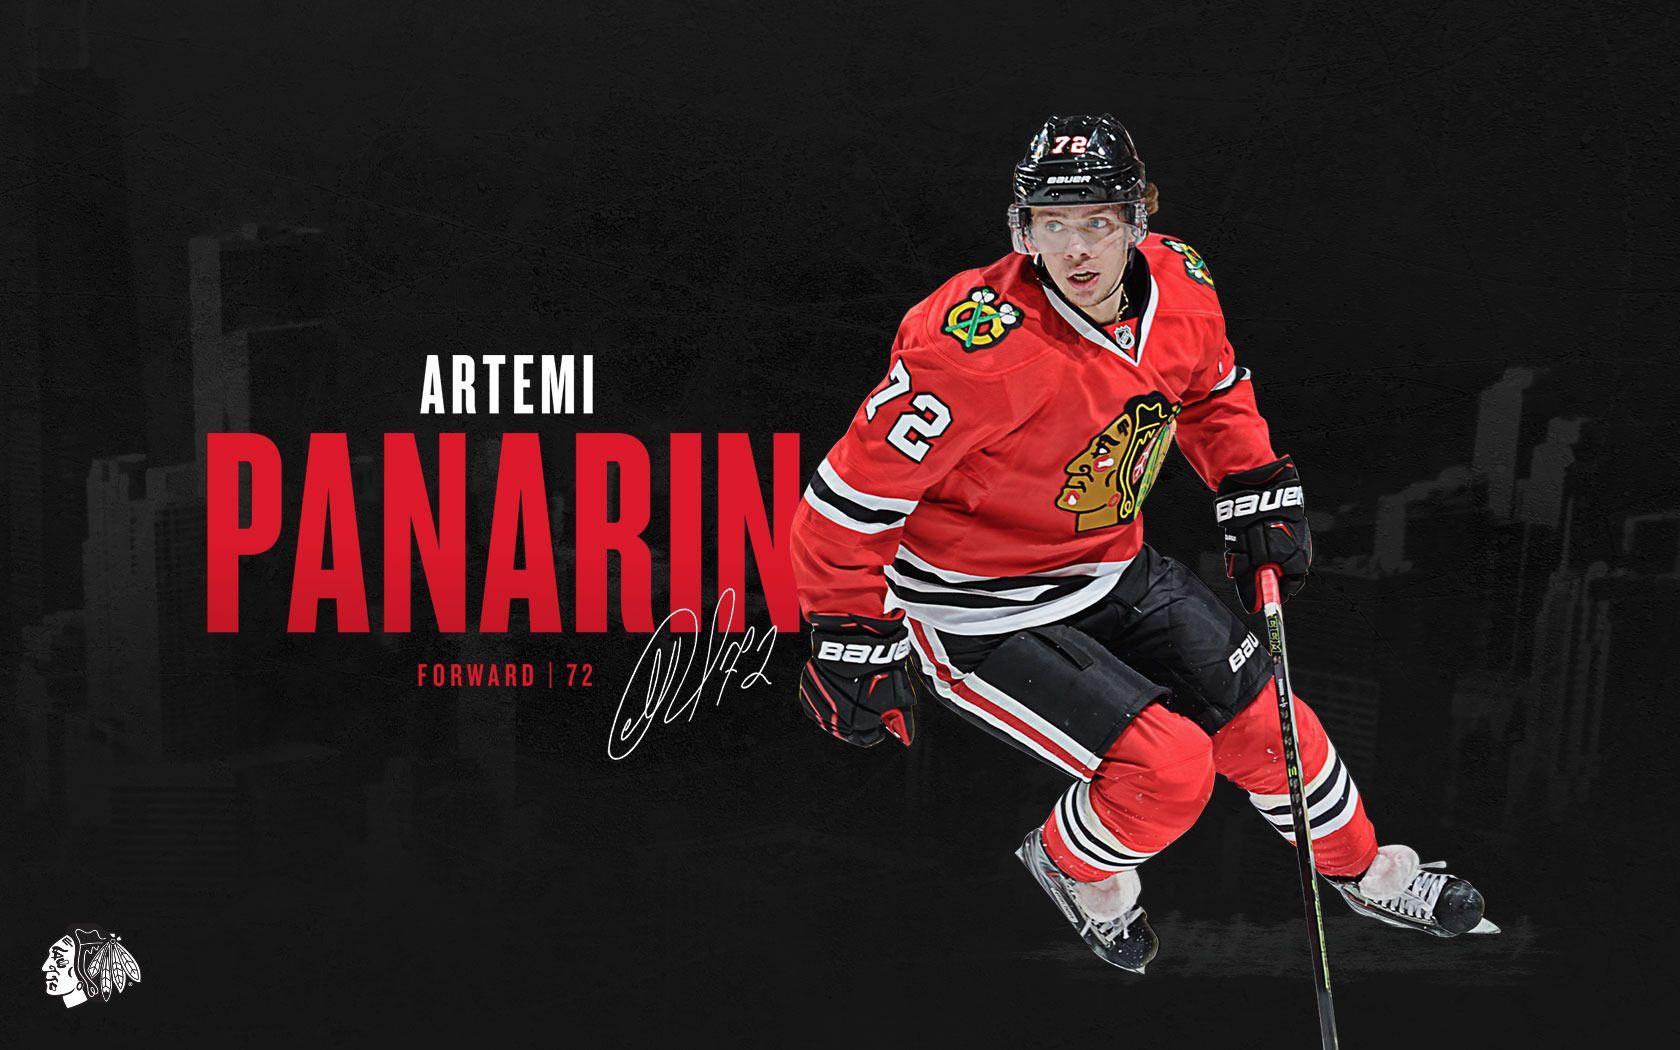 87a88388437 Artemi Panarin. #BreadMan #Blackhawks   Artemi Panarin   Chicago ...